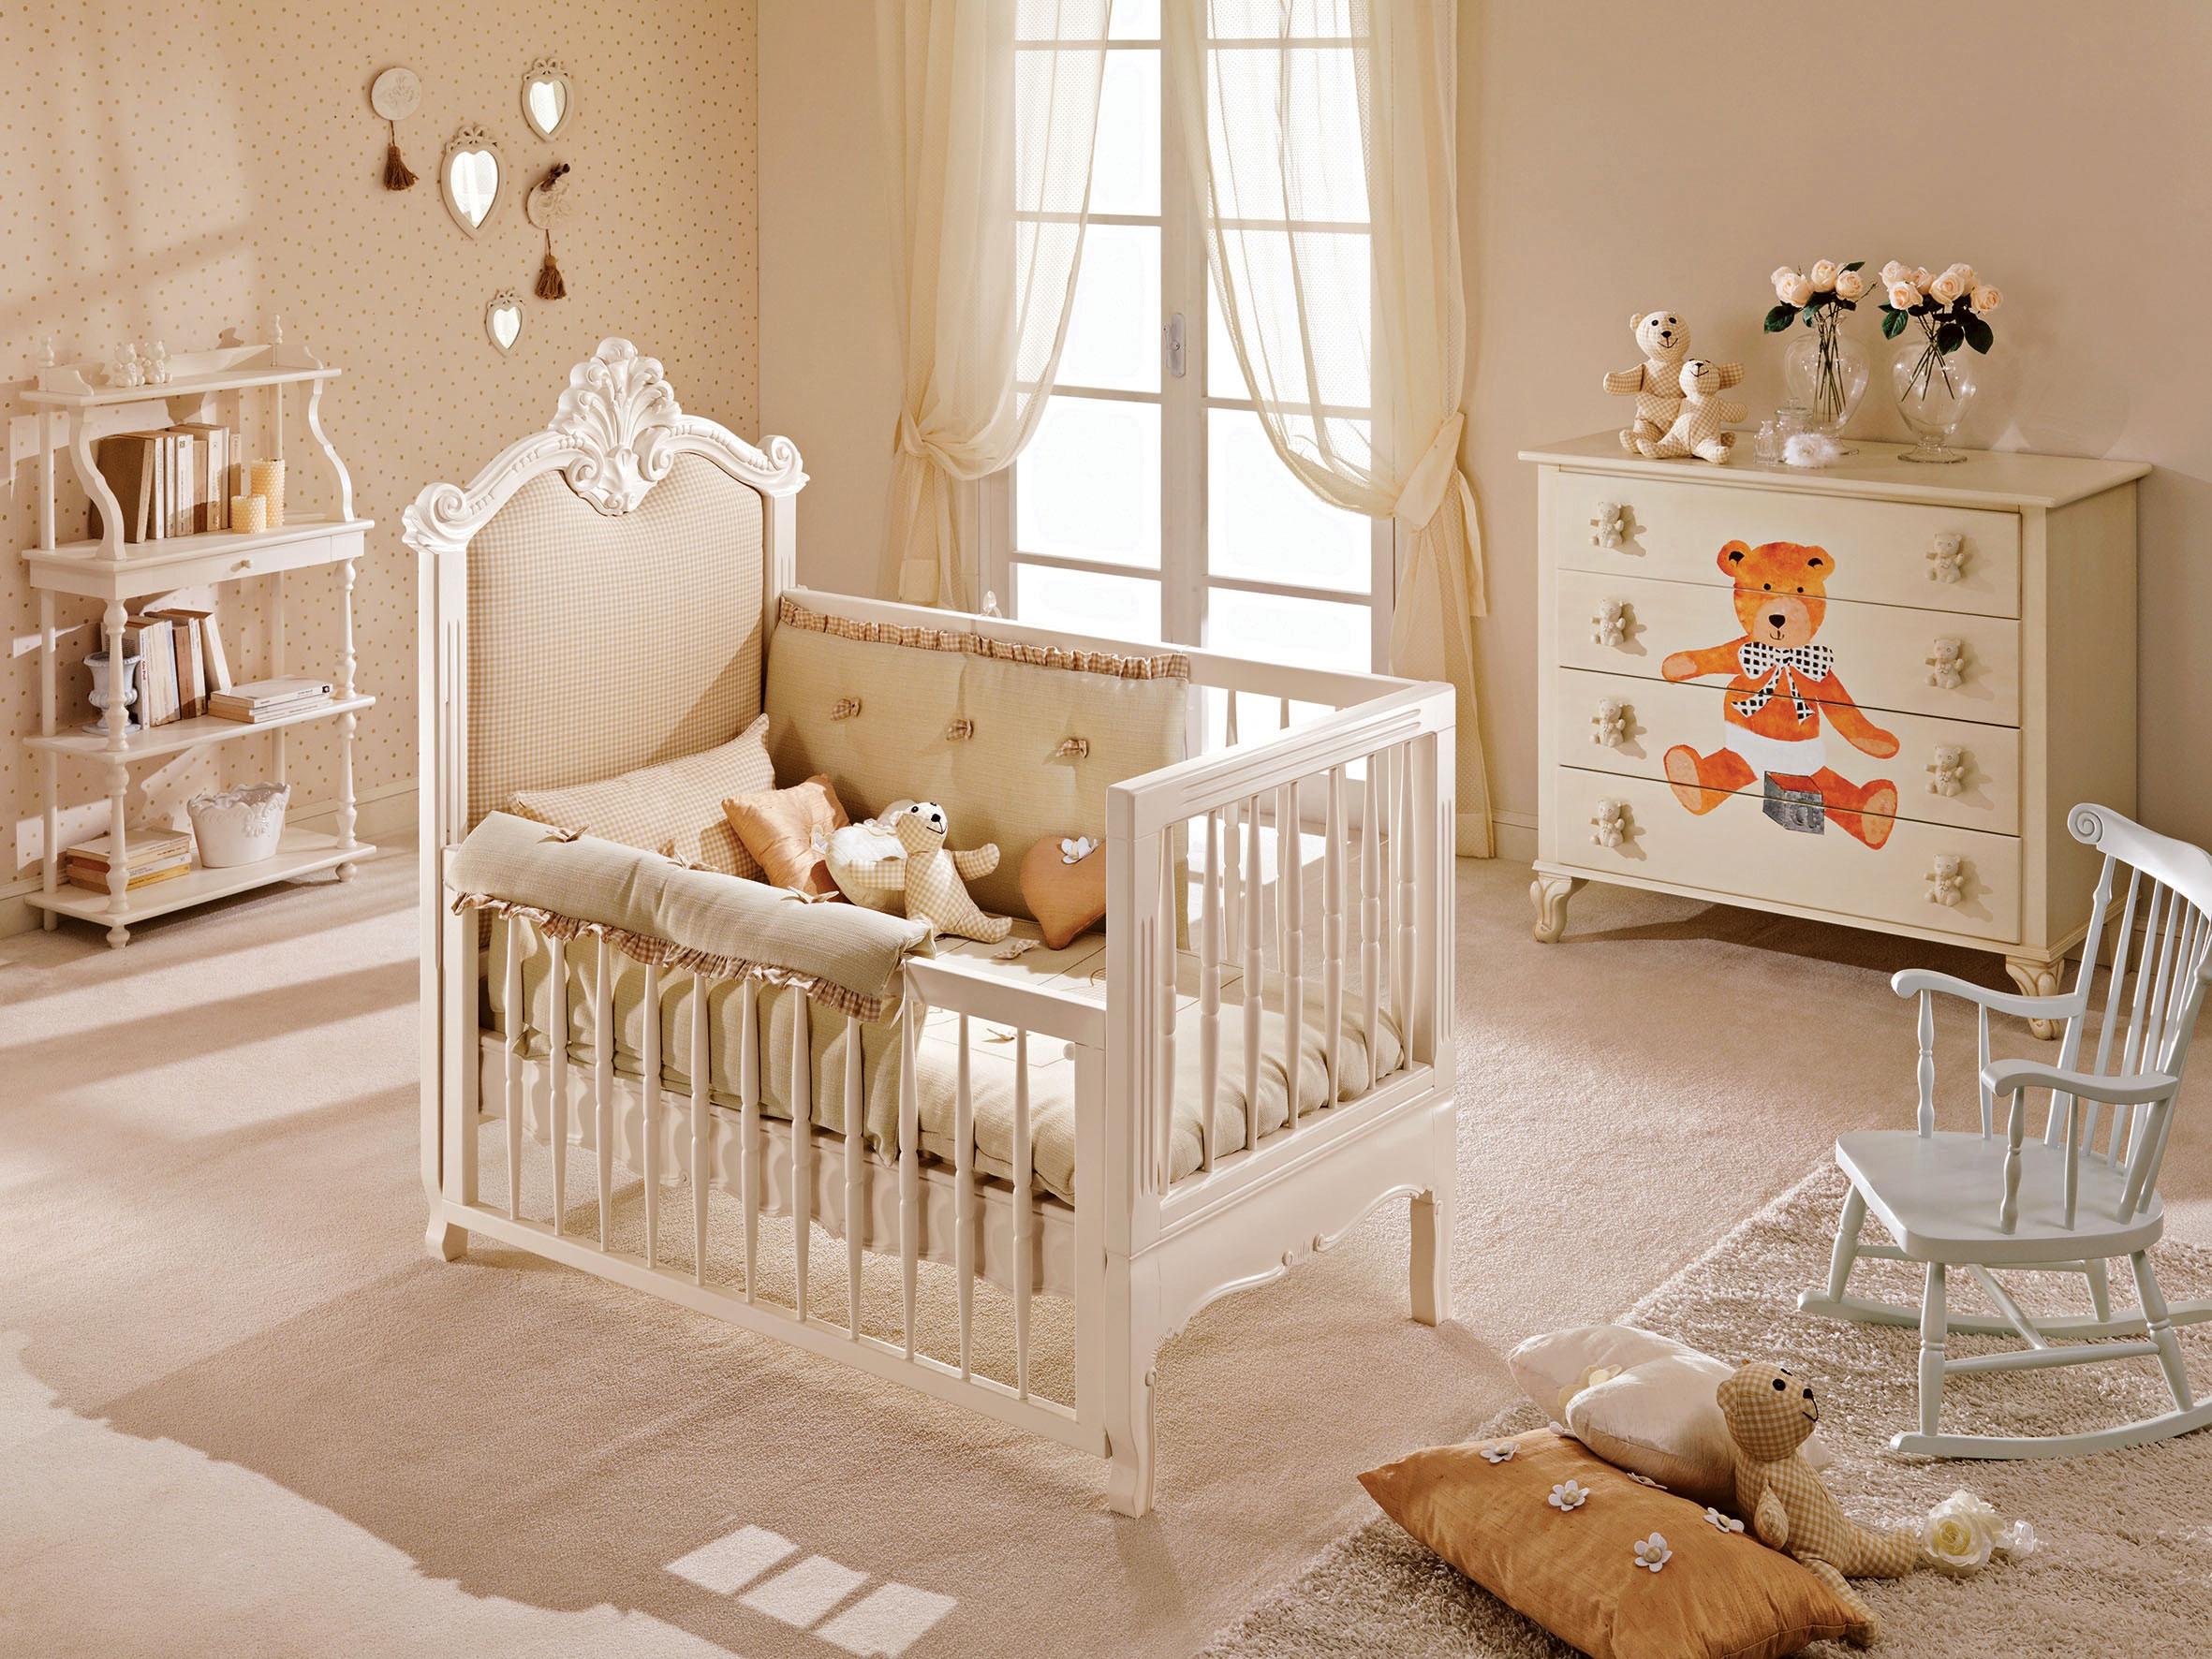 Berceau b b tiffany avec garde corps amovible piermaria so nuit - Chambre bebe autour de bebe ...